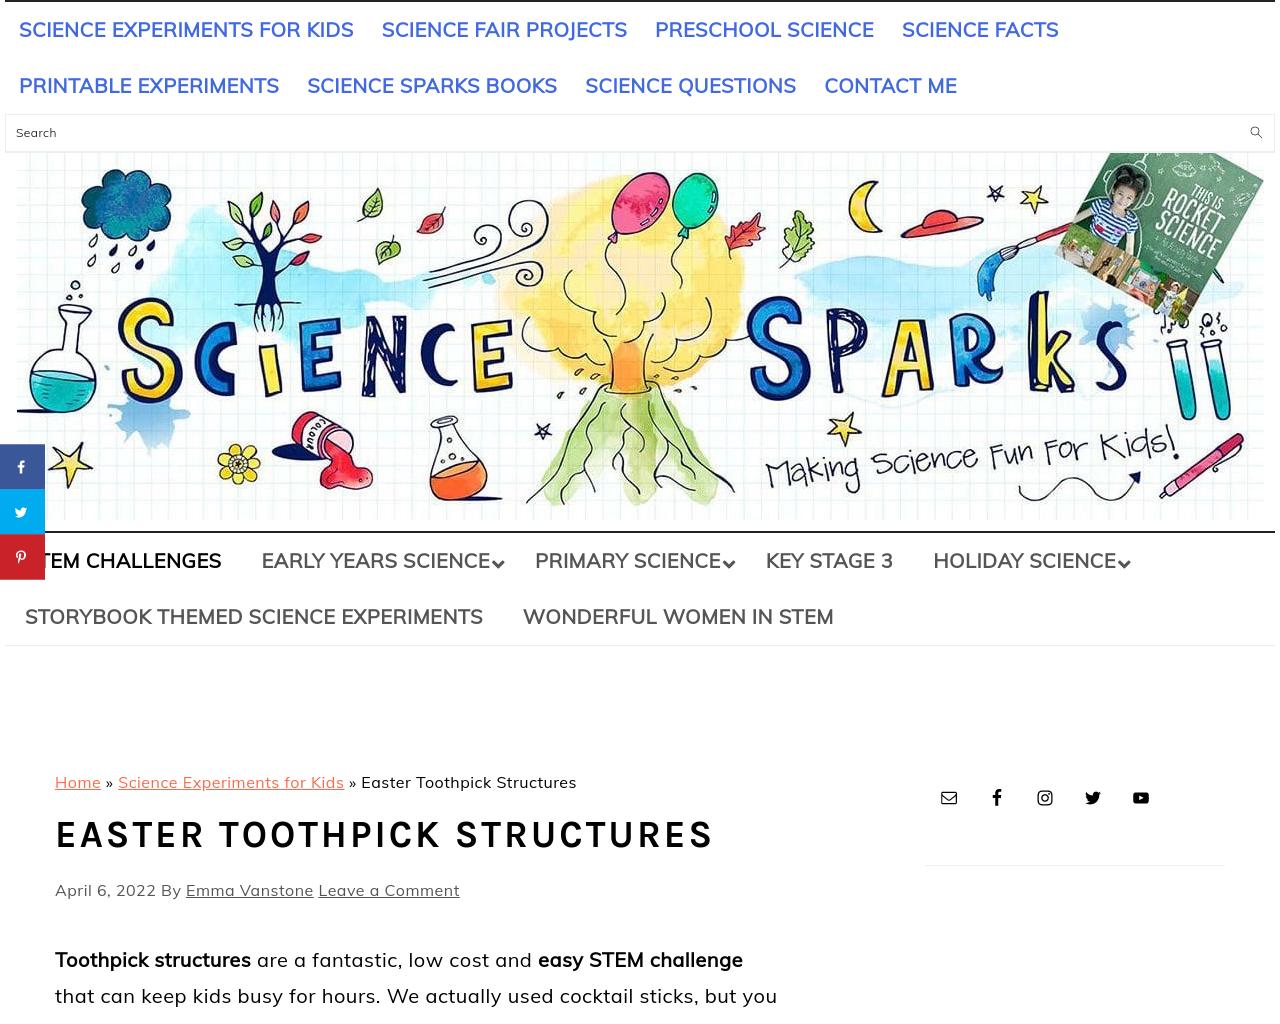 Science Sparks